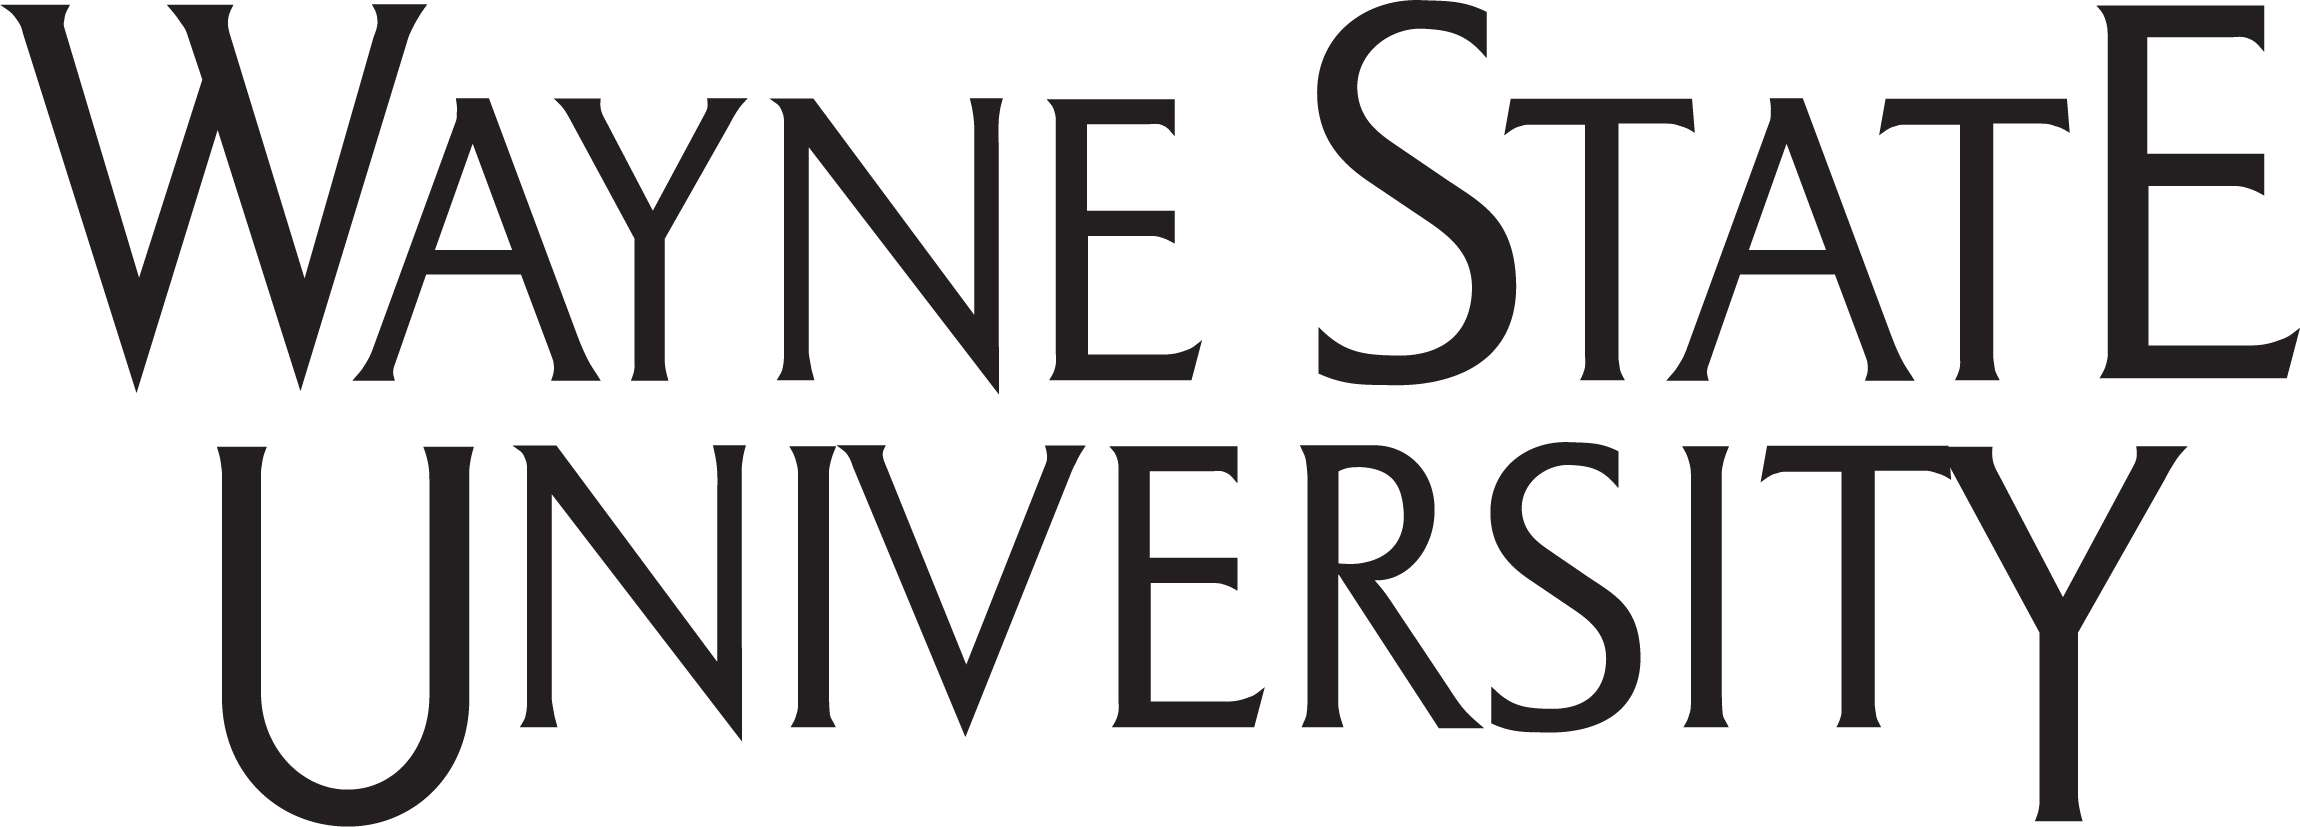 WSU Logo [PDF   Wayne State University] png